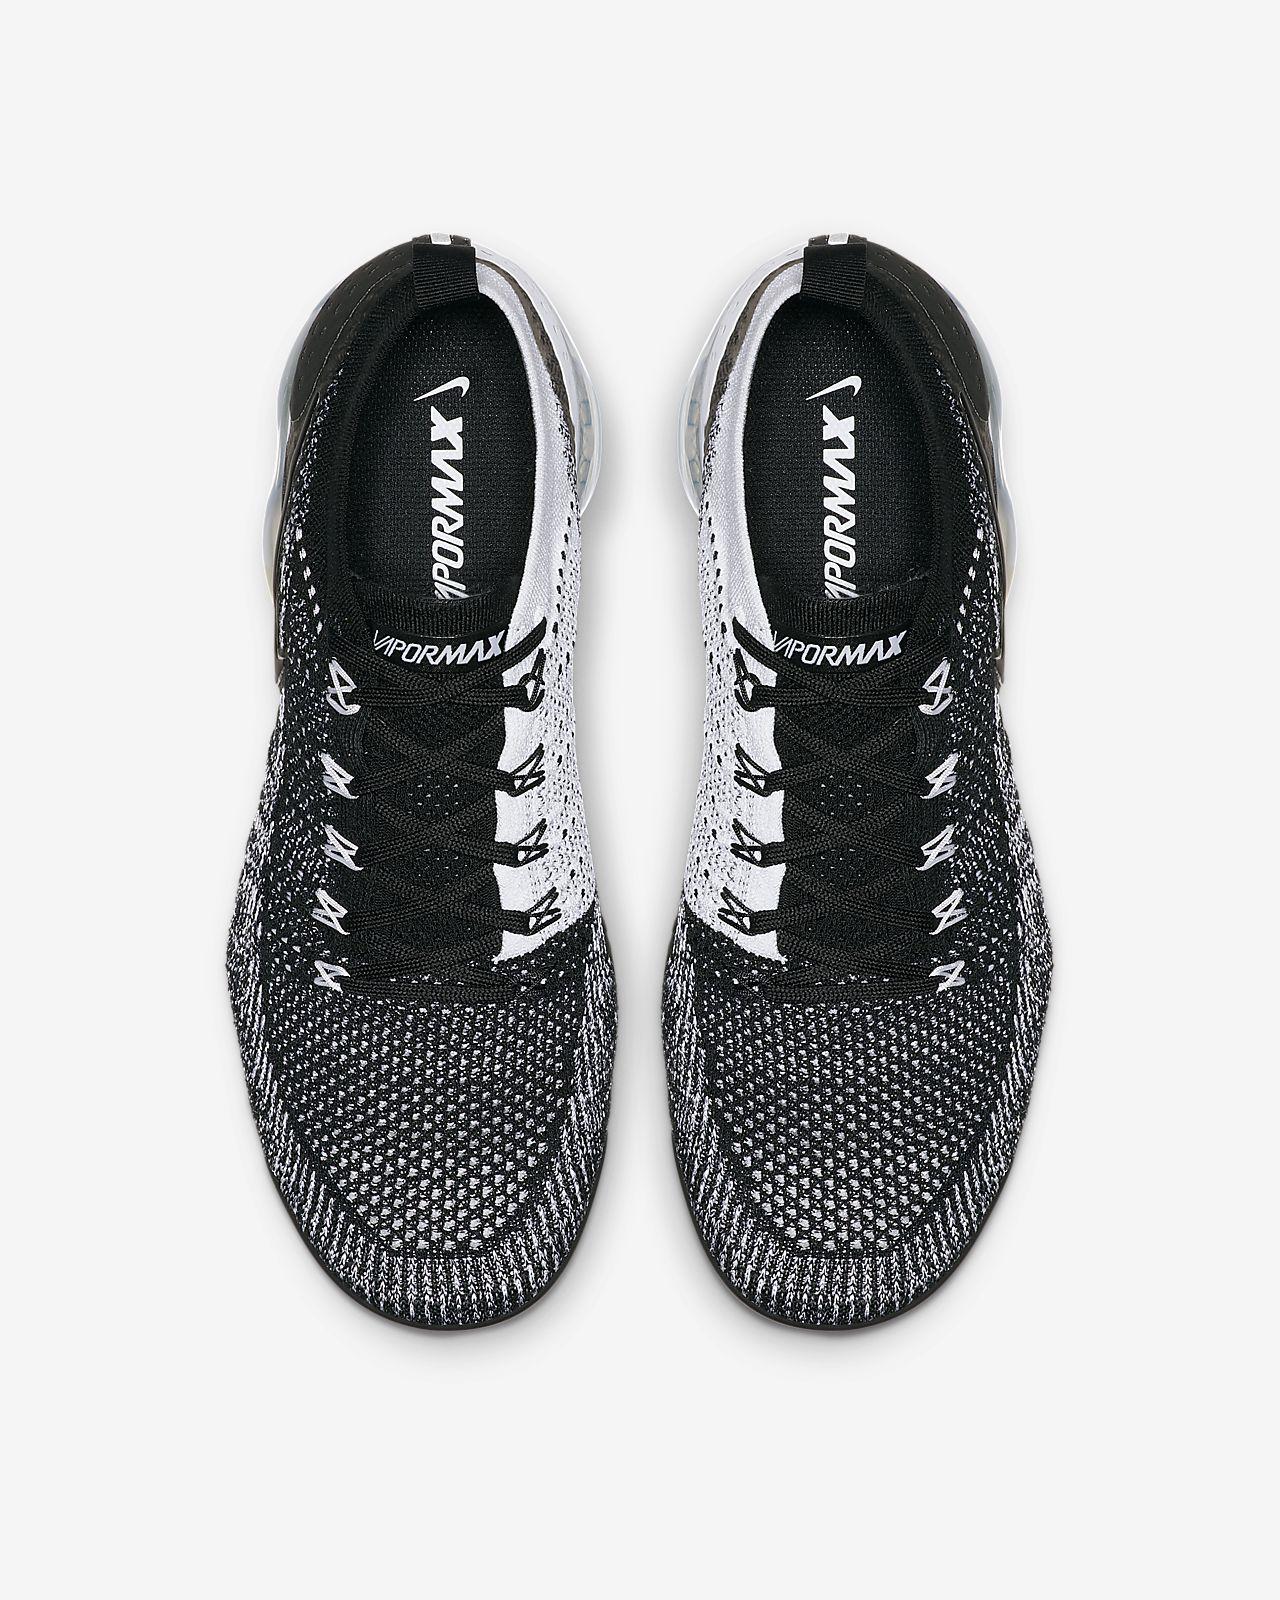 48a383bf807 Nike Air VaporMax Flyknit 2 Shoe. Nike.com SG